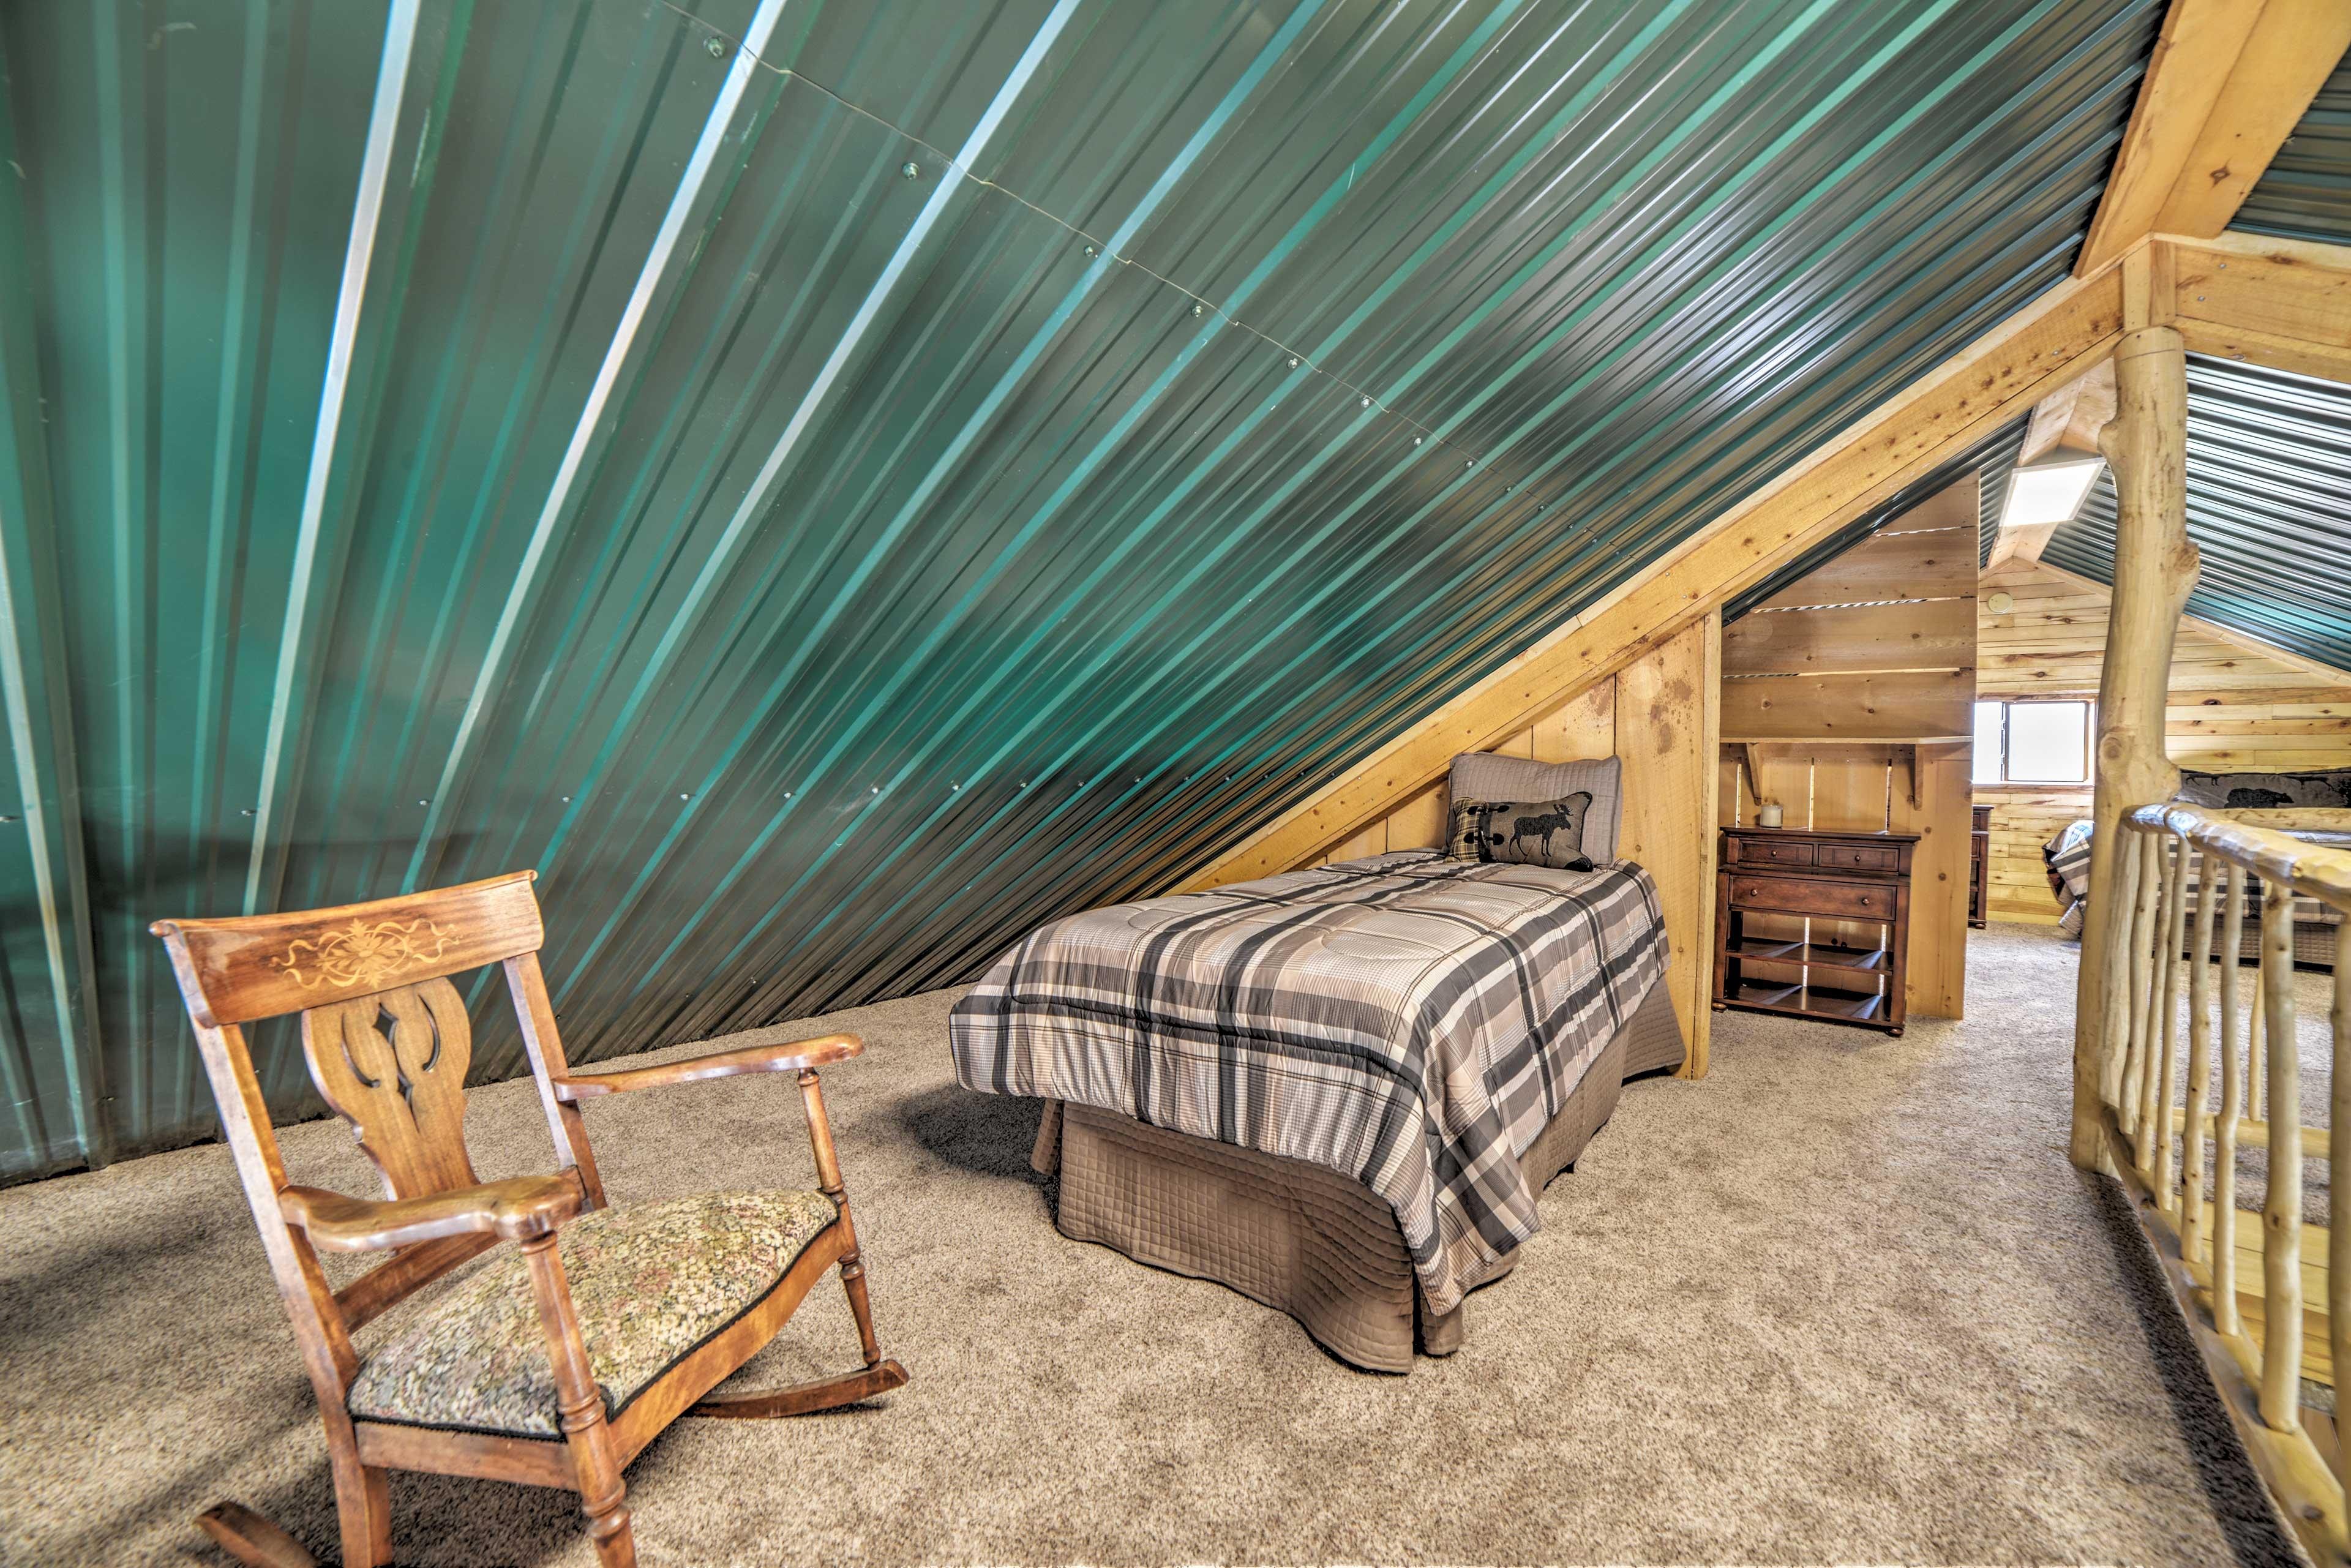 Sleeping Loft | 1 XL Twin Bed | Rocking Chair